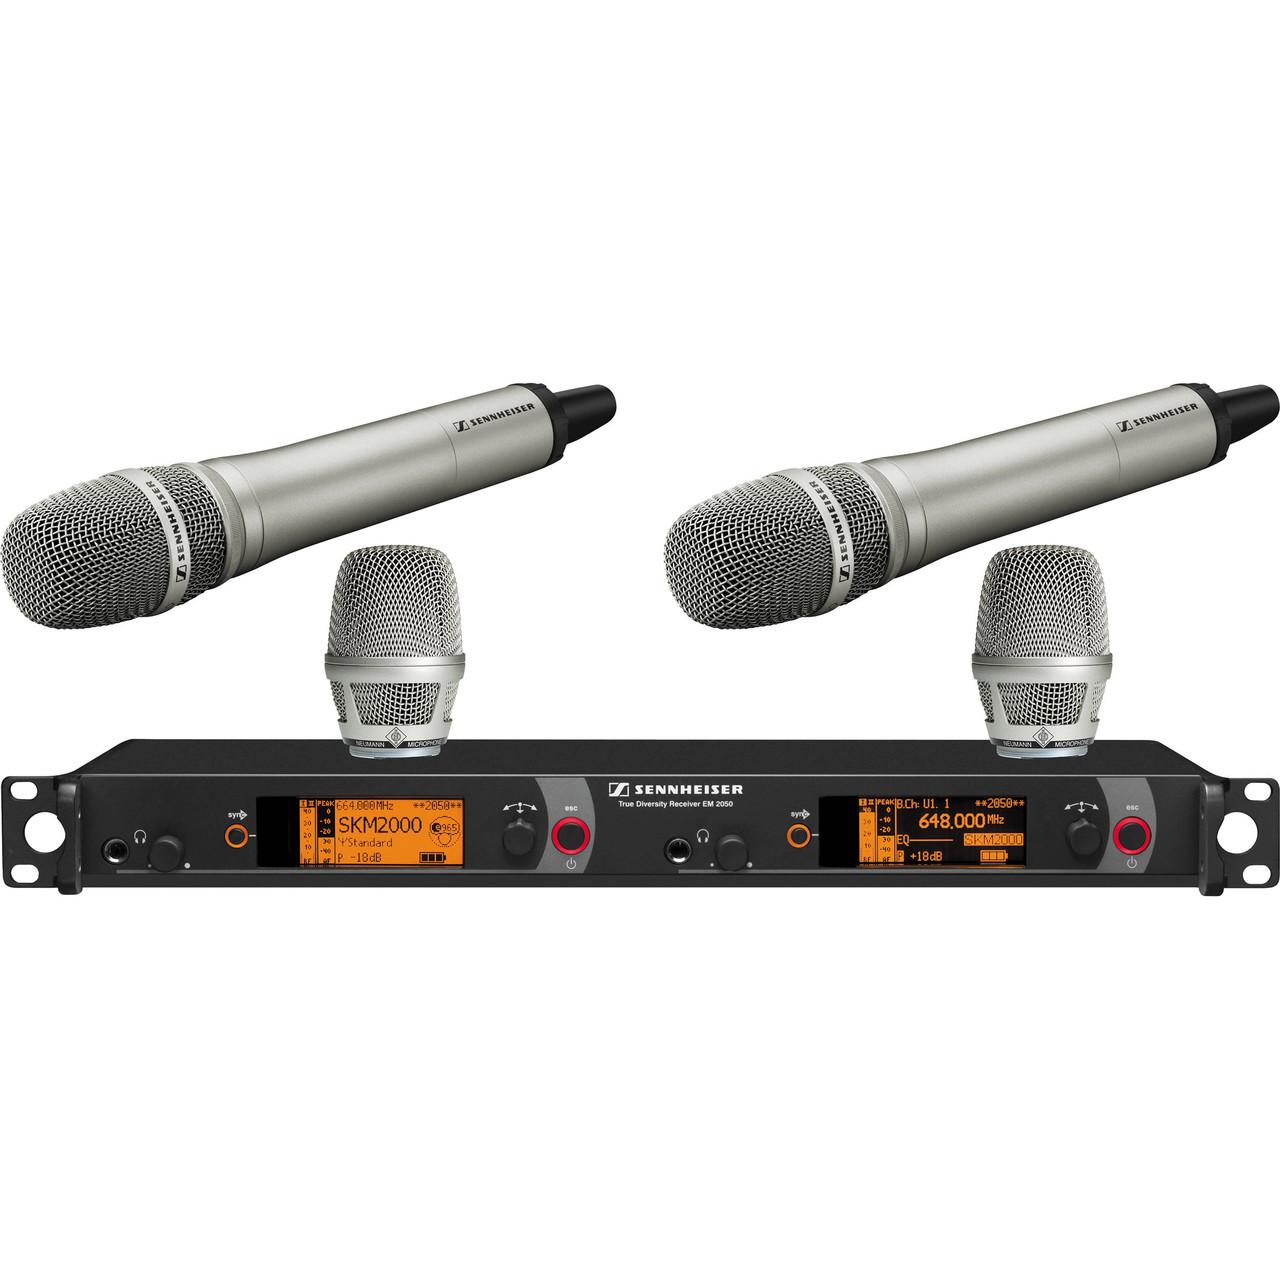 Беспроводная система Sennheiser 2000 Series Dual KK 205 Bw / 626 - 698MHz (2000H2-205NI-B)